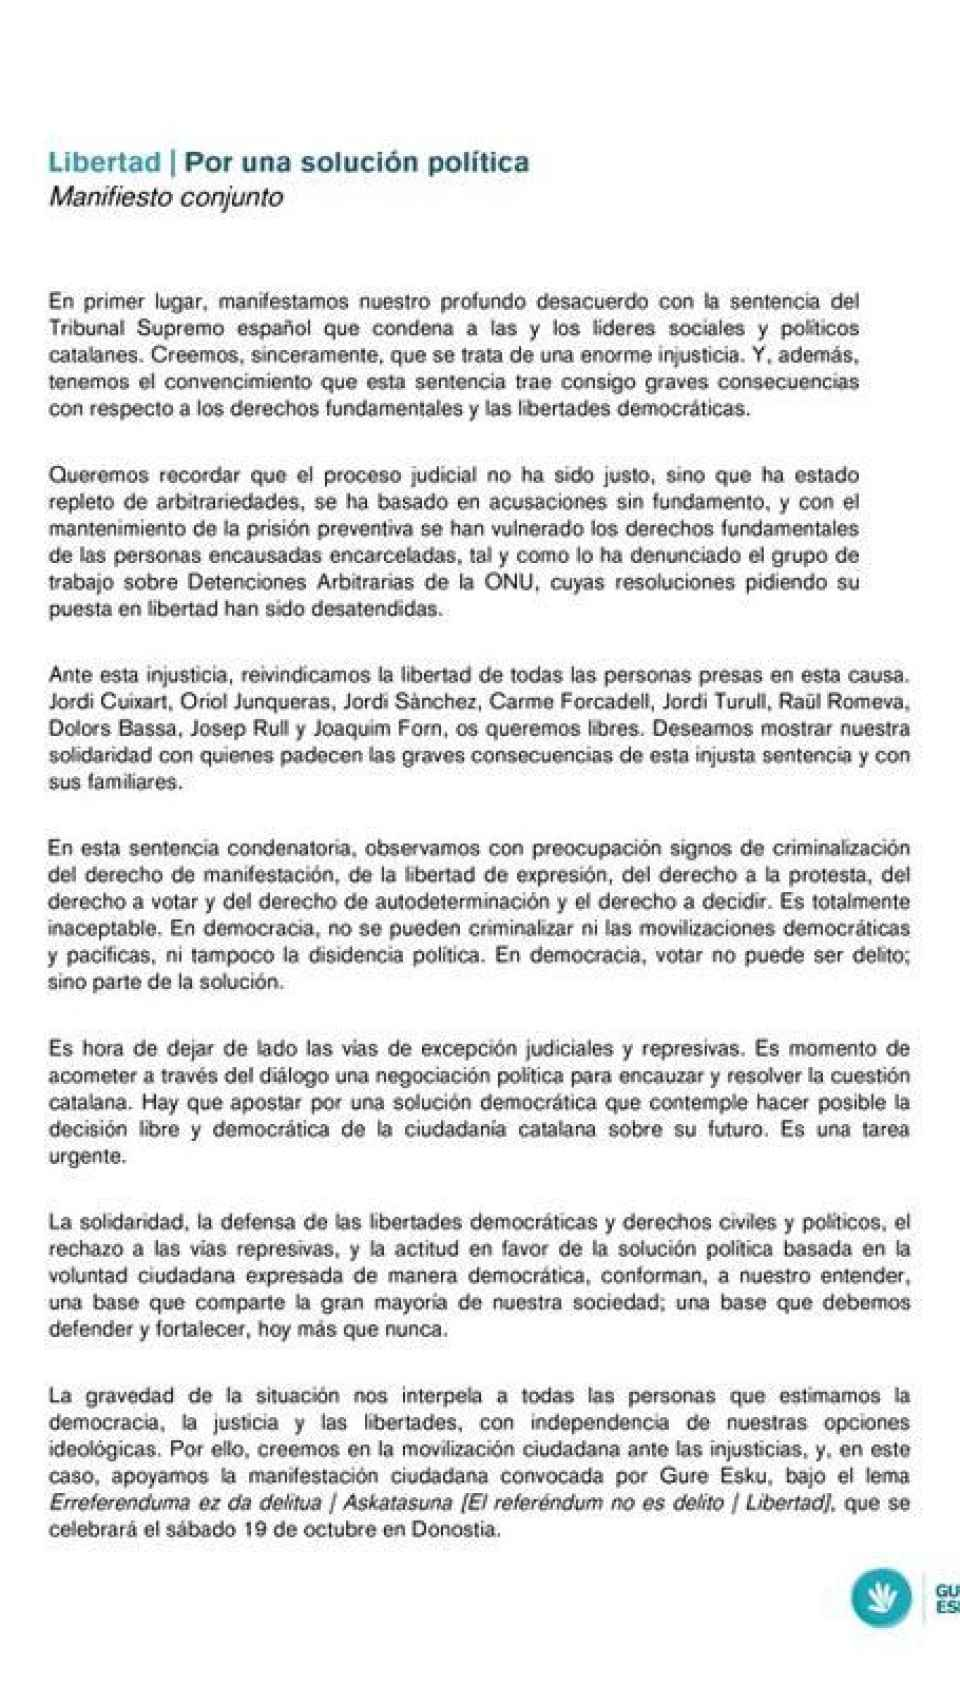 Manifiesto plataforma soberanista 'Gure Esku Dago'